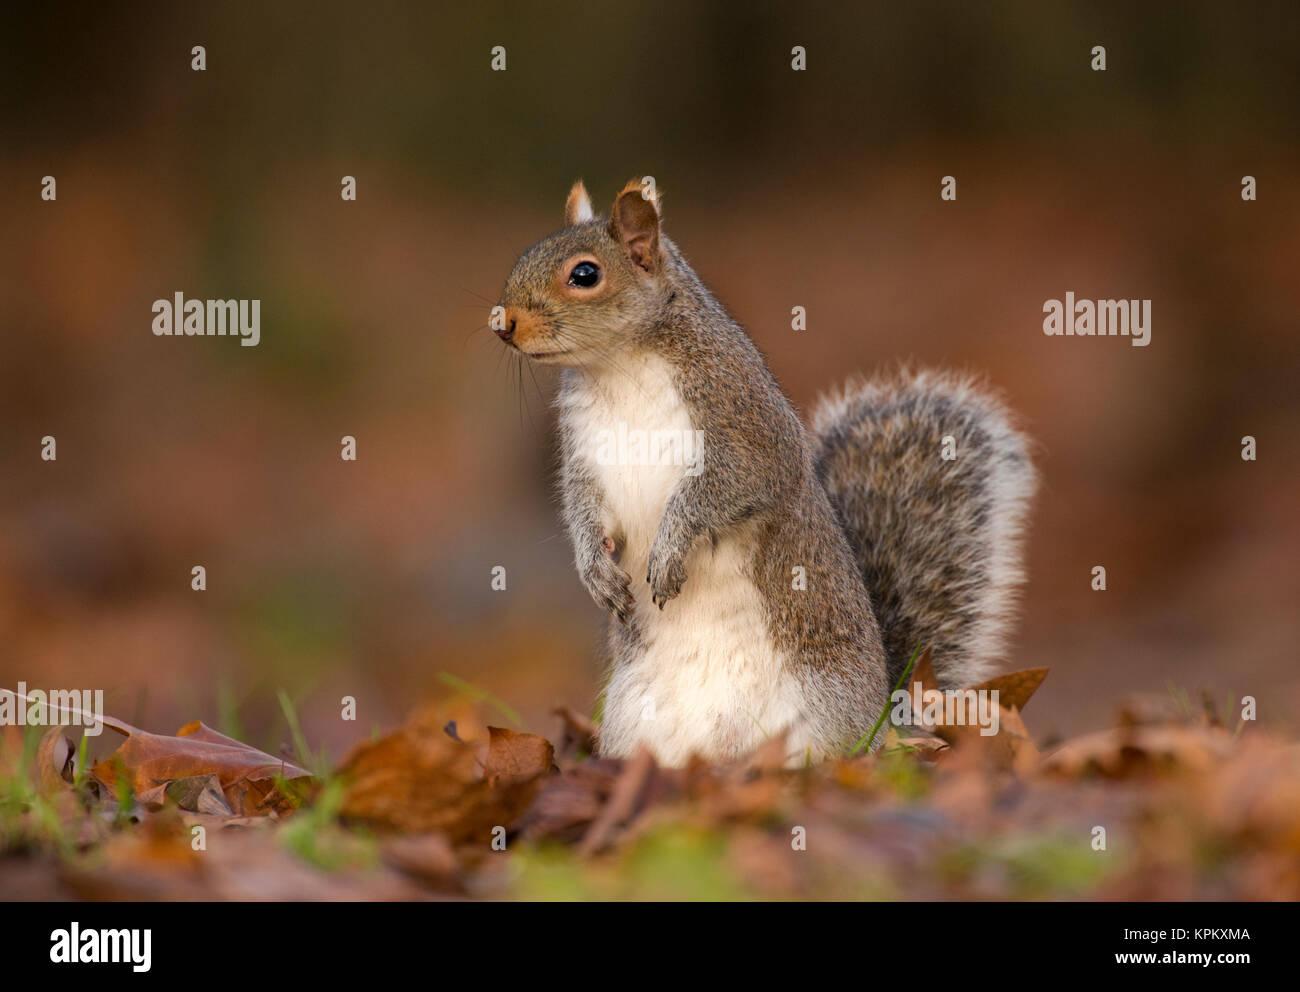 Grey Squirrel or Eastern Gray squirrel, (Sciurus carolinensis), Regents Park, London, United Kingdom - Stock Image